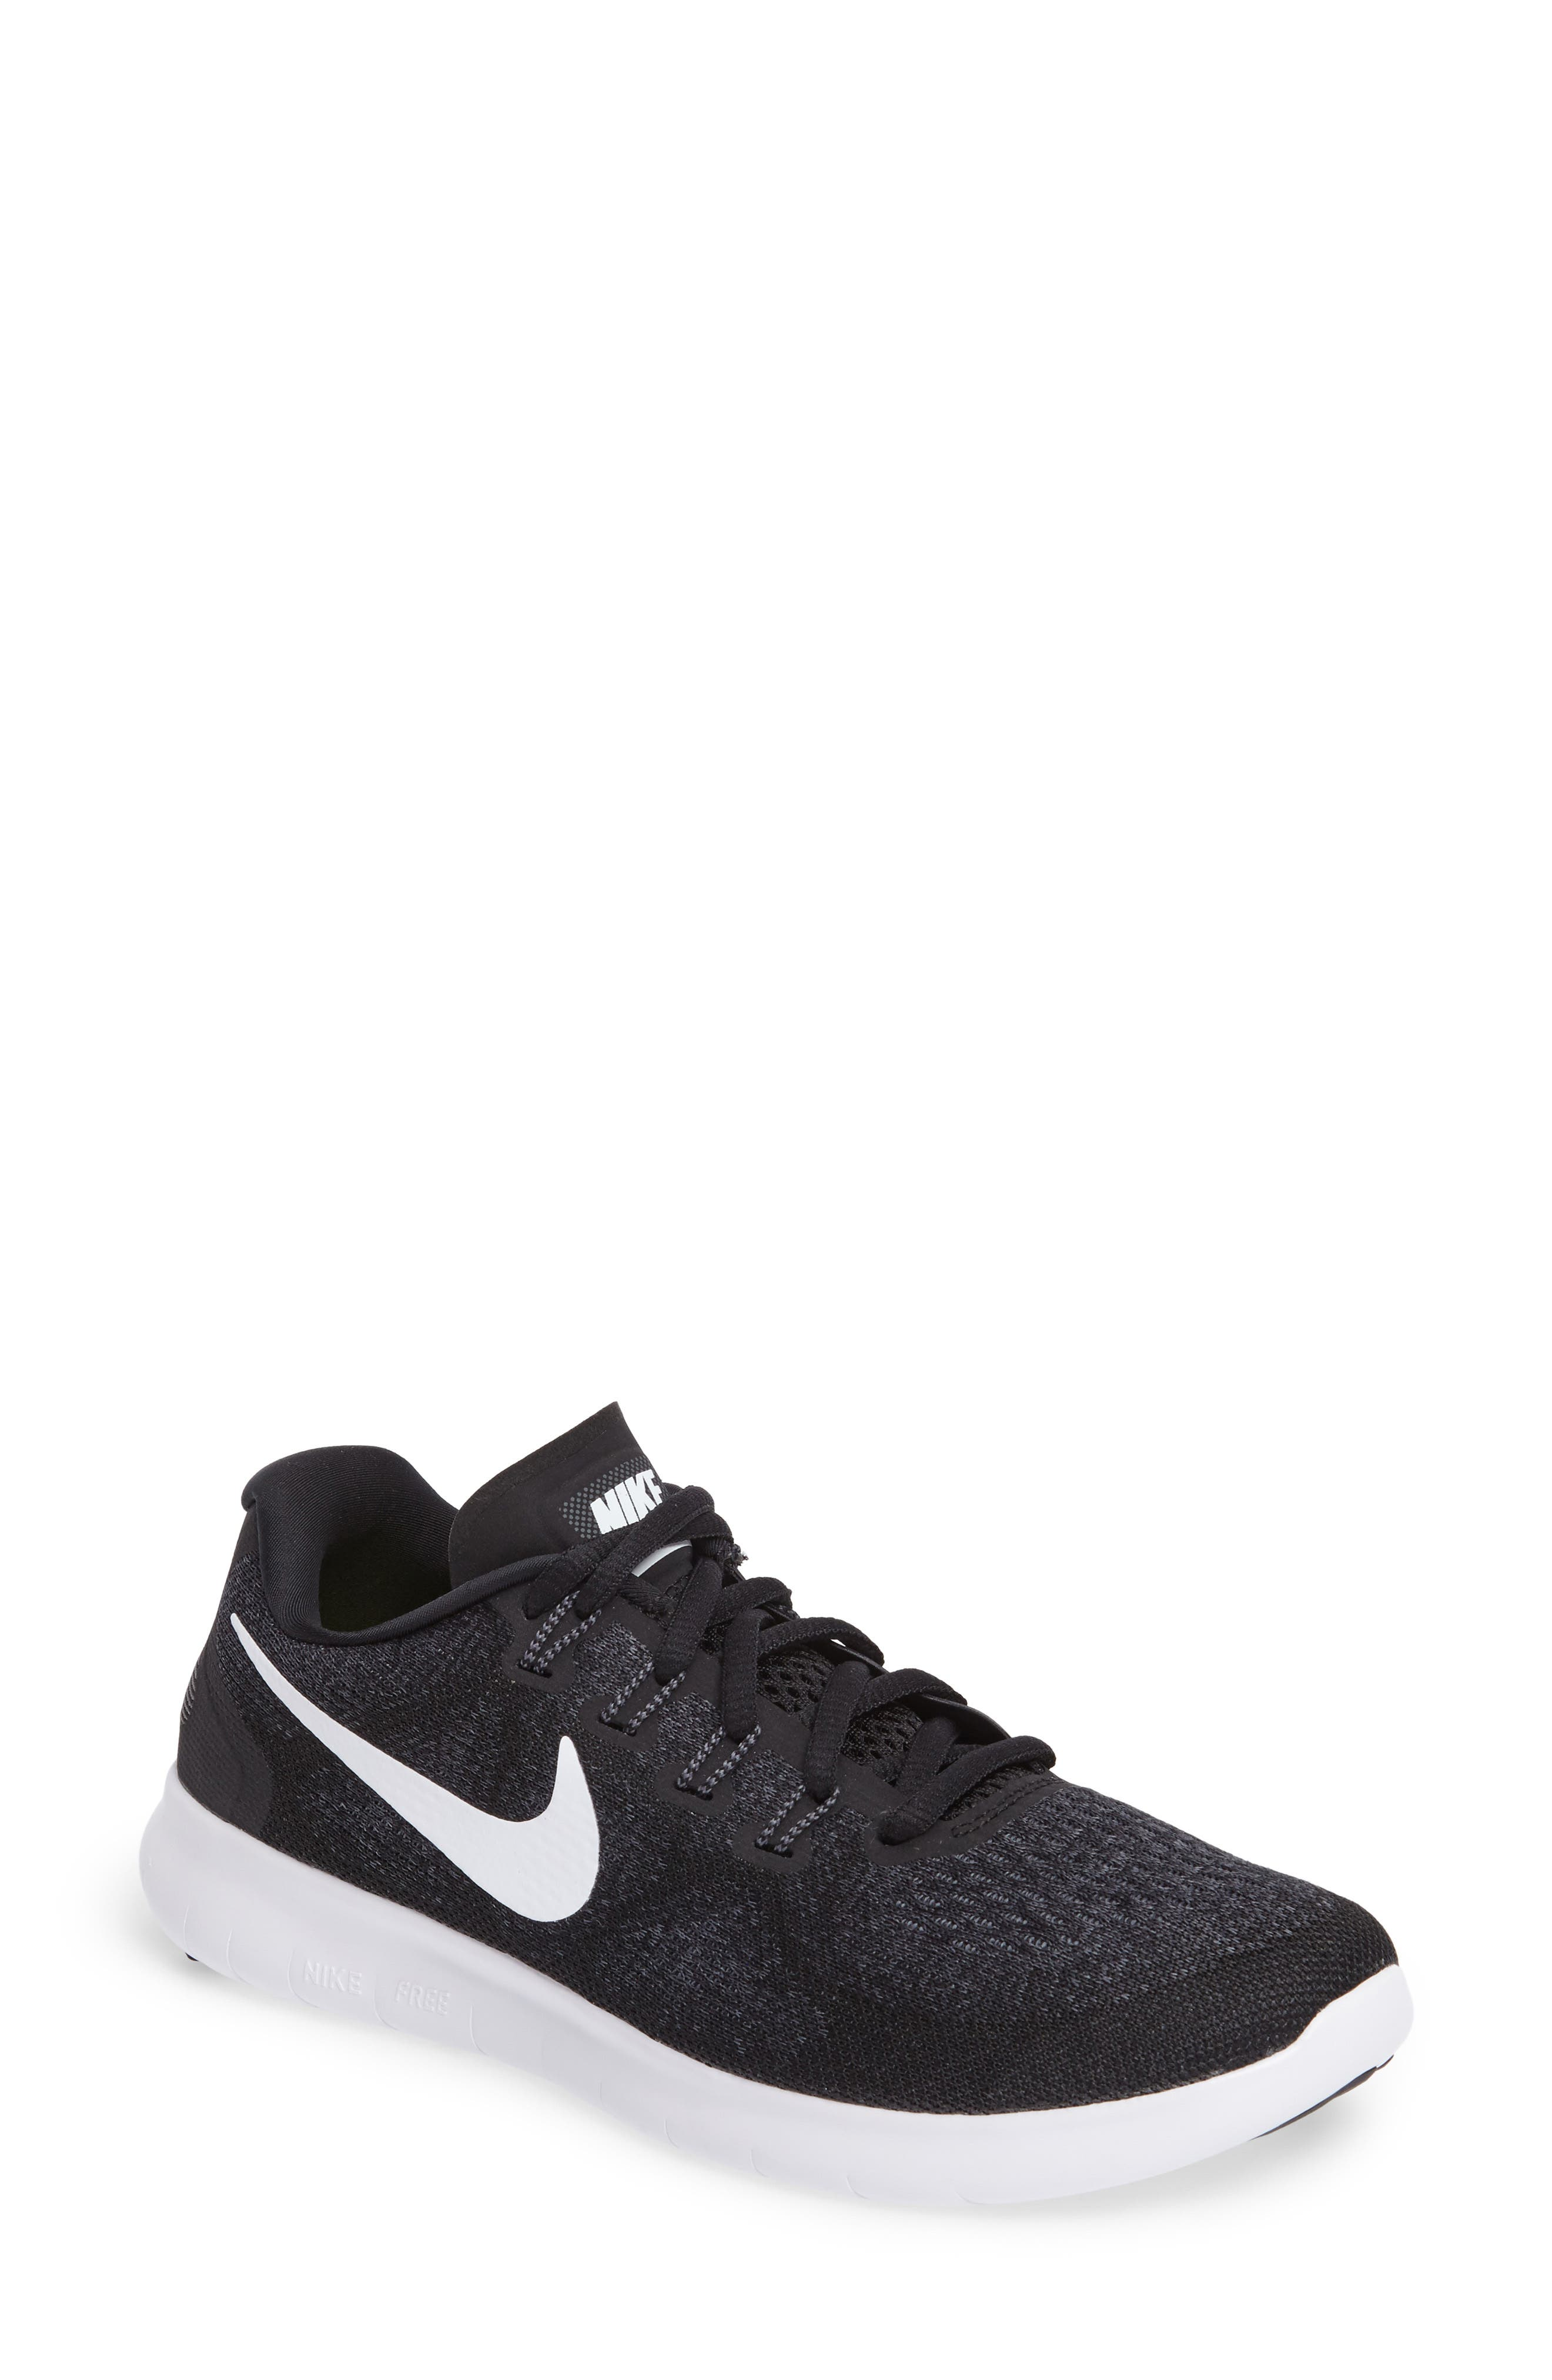 Main Image - Nike Free RN 2 Running Shoe (Women)